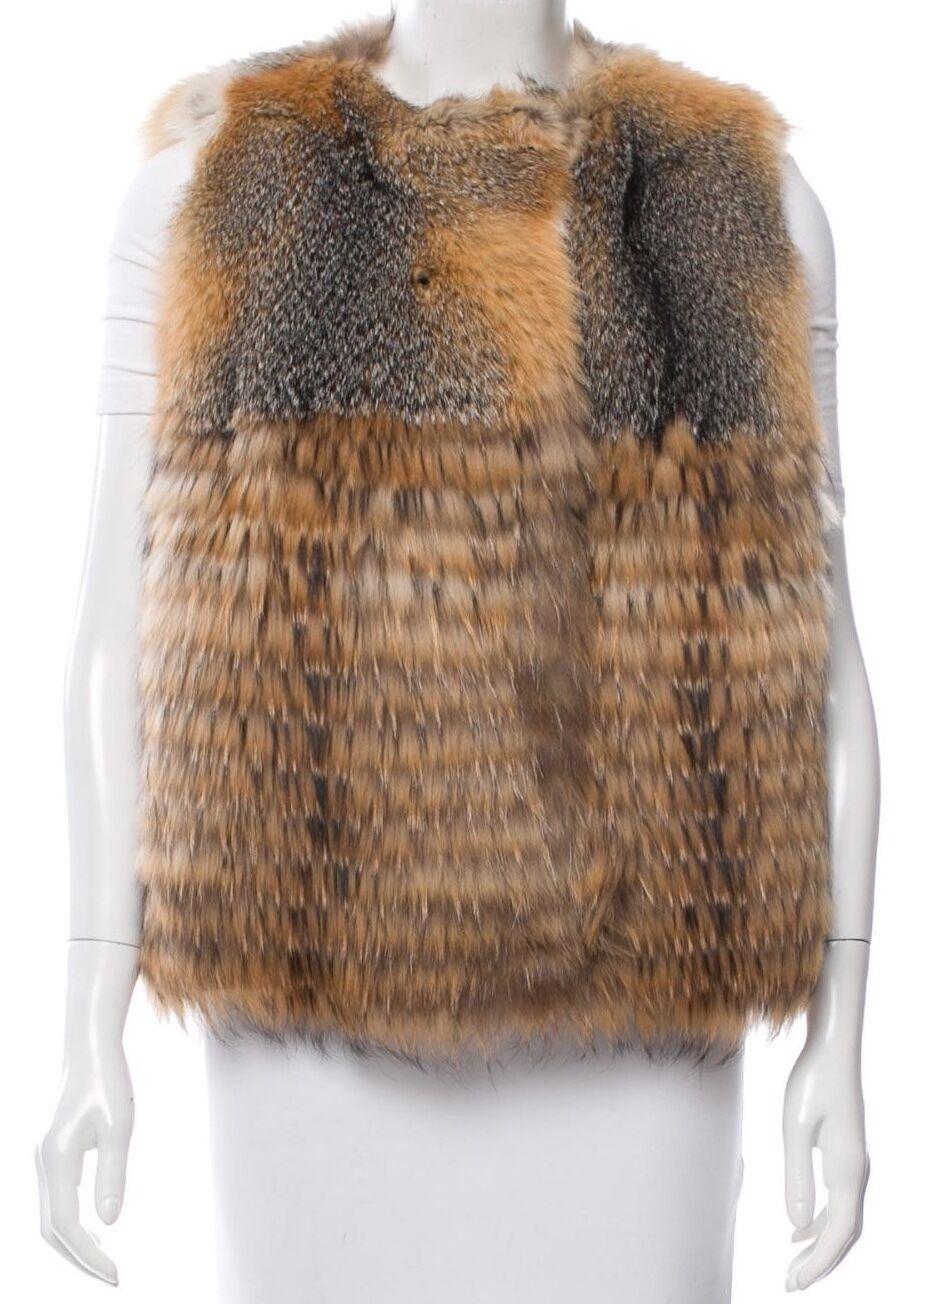 Meteo x Yves Salomon Fox and Raccoon Fur Vest SZ 34 = Fits US S - NWOT RT  2.5K